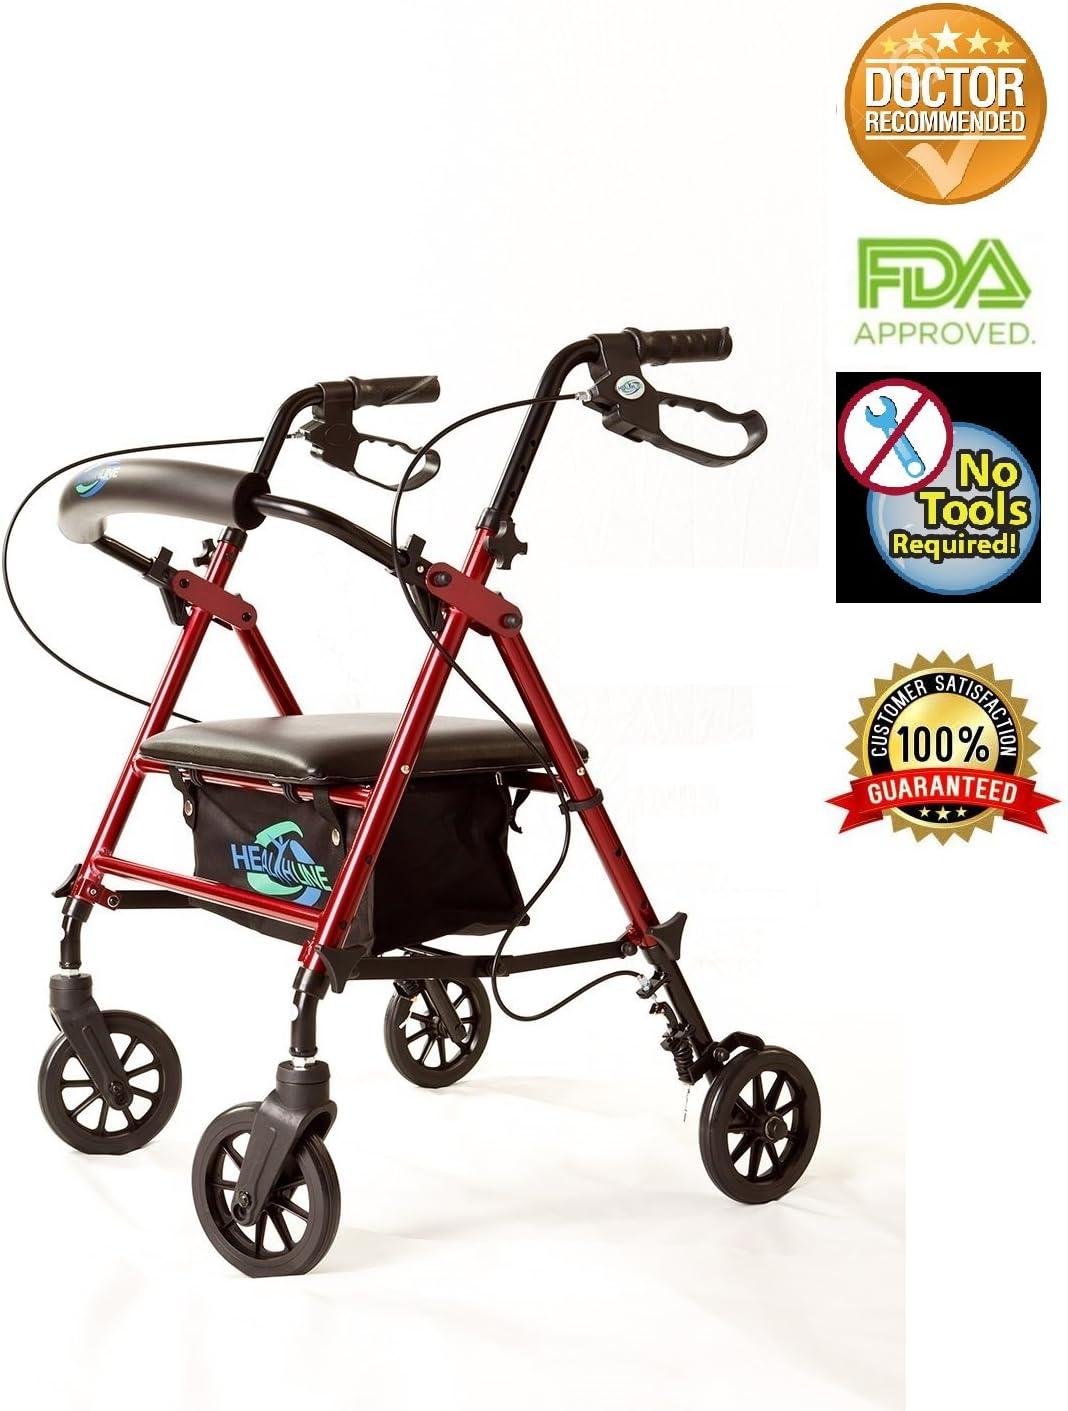 Super Light Rollator Lightweight Aluminum Folding Walker with Seat and Loop Brakes, 6